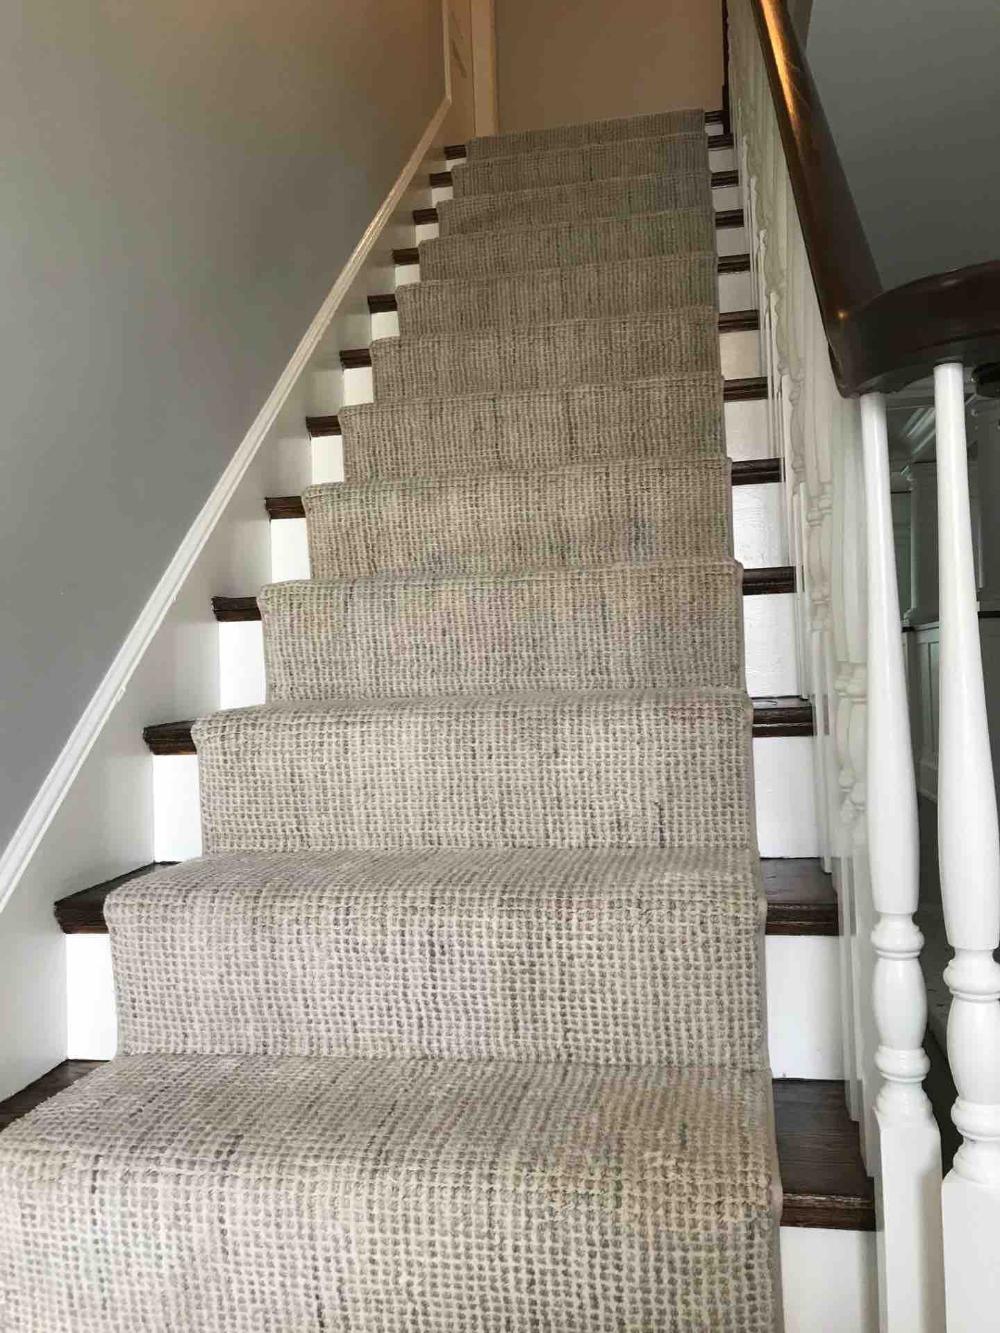 Custom Rug Fabrication In 2020 Custom Rugs Modern Stairs | Custom Stair Runners Near Me | Staircase Remodel | Animal Print | Rugs | Basement Stairs | Stair Treads